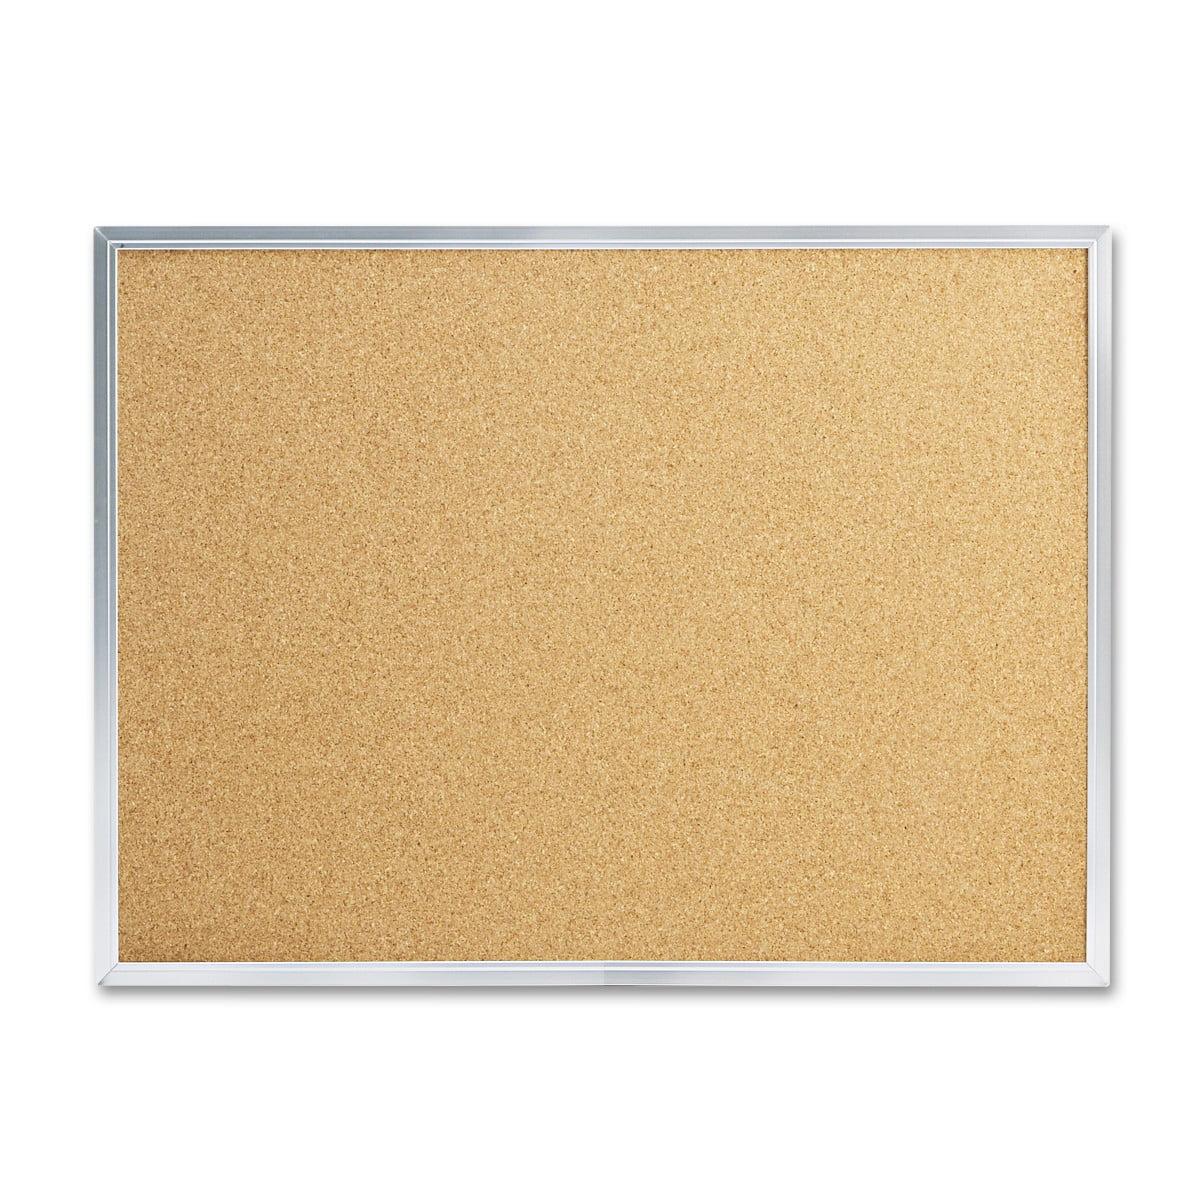 "Mead Cork Bulletin Board, 24"" x 18"", Silver Aluminum Frame"